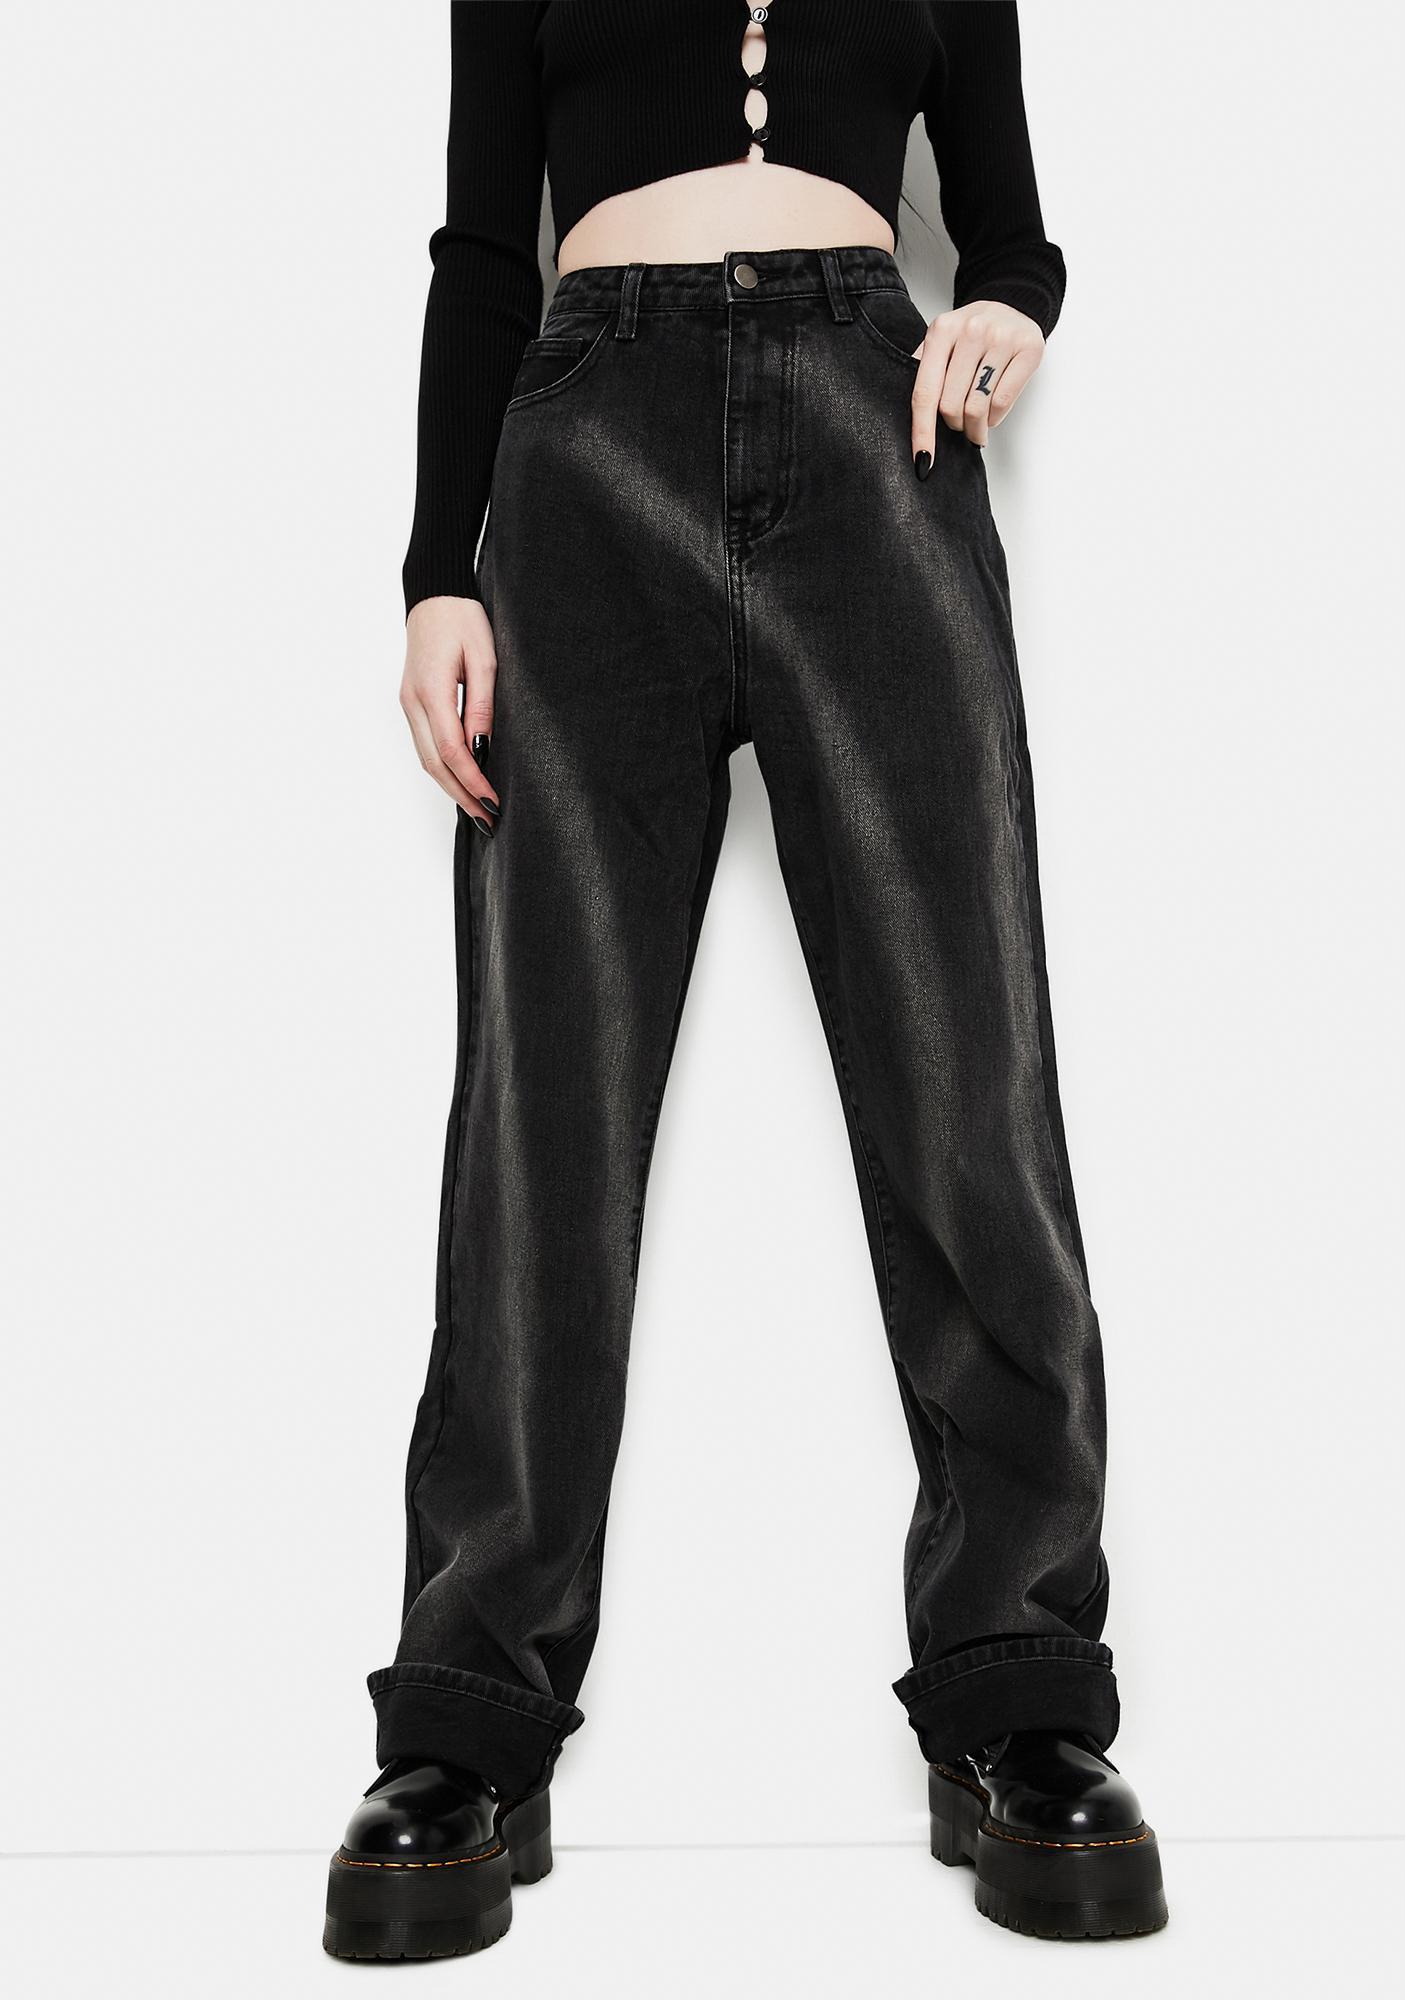 Momokrom Washed Black Tie Dye Circle Effect Baggy Wide Leg Jeans